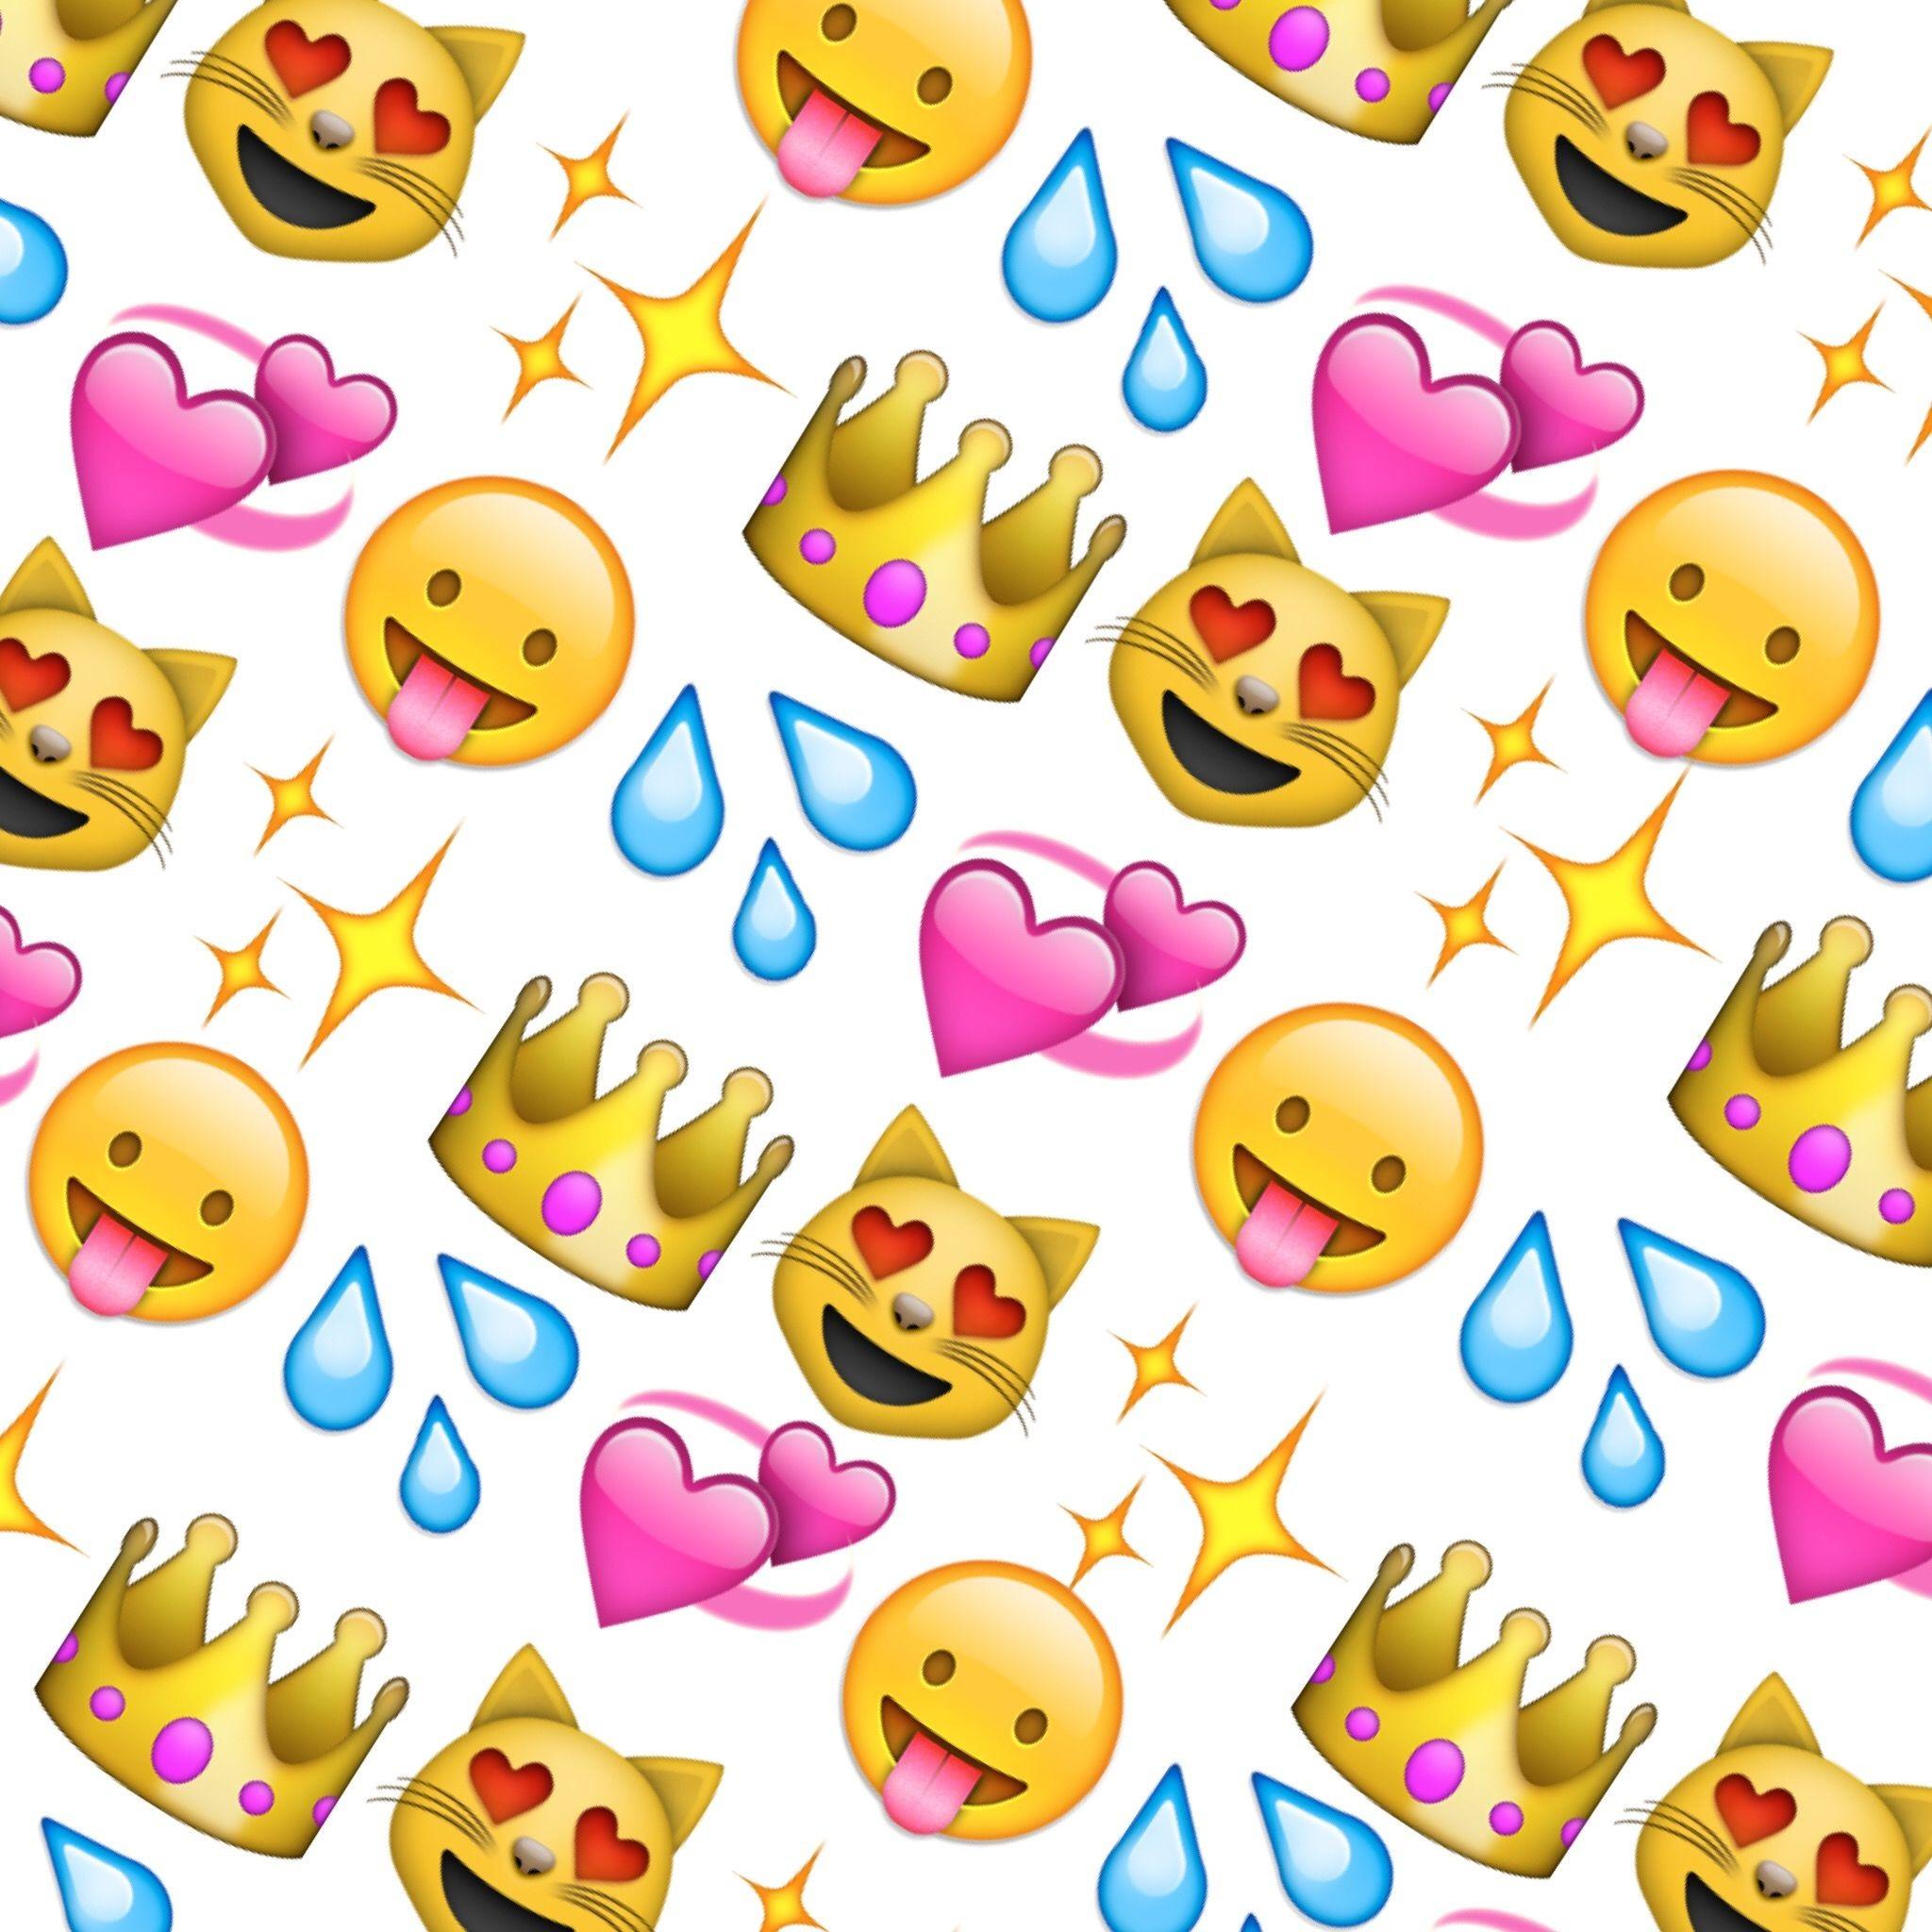 2048x2048 Gorgerous Emoji Wallpaper 2048x2048  C2 B7 Download  C2 B7 Free Emoji Wallpaper